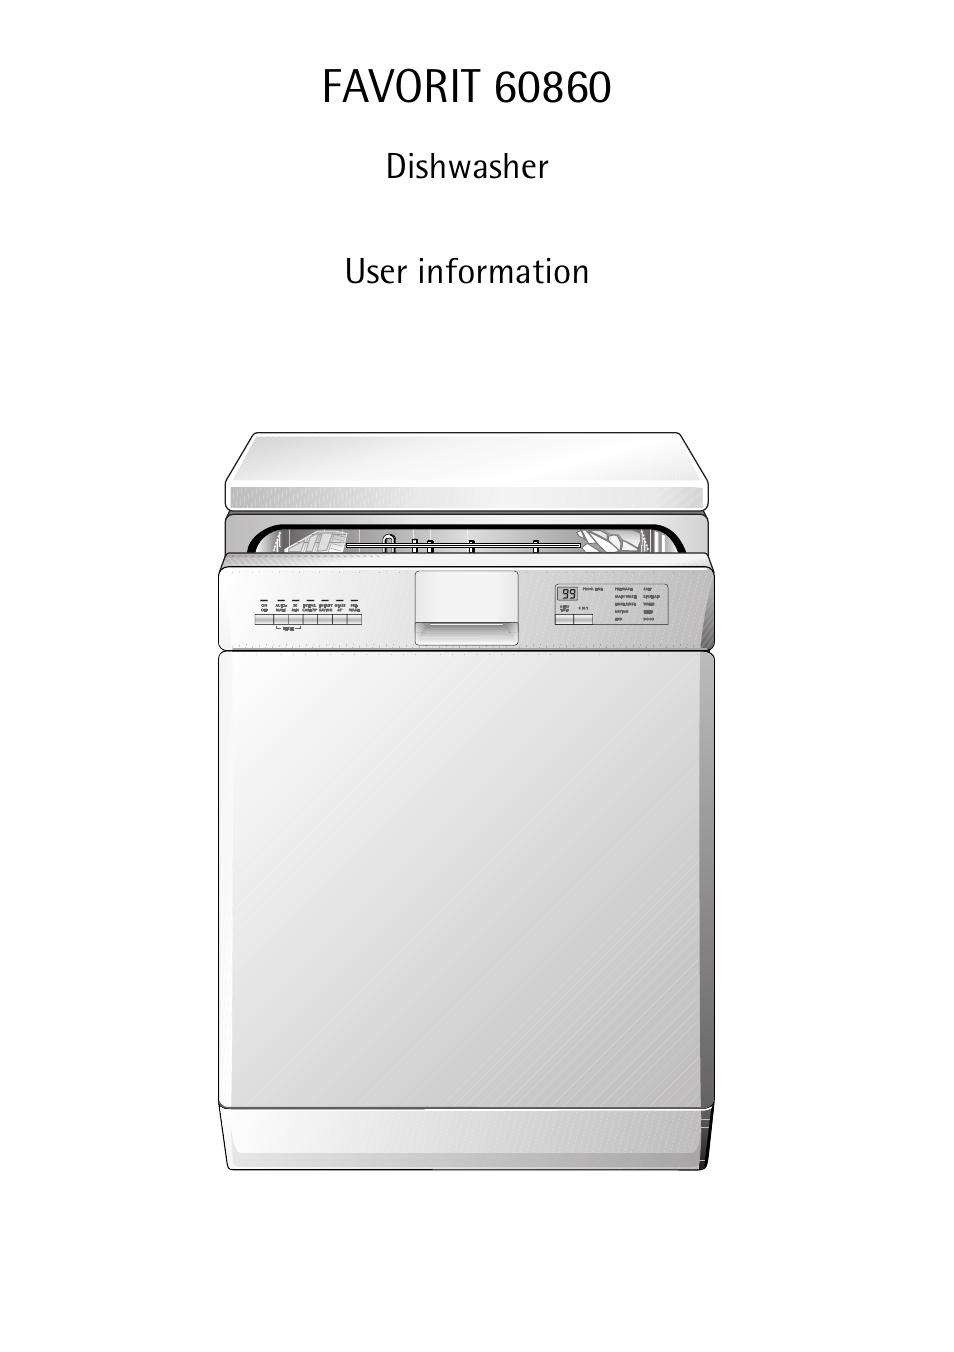 Aeg Favorit 60860 User Manual 48 Pages